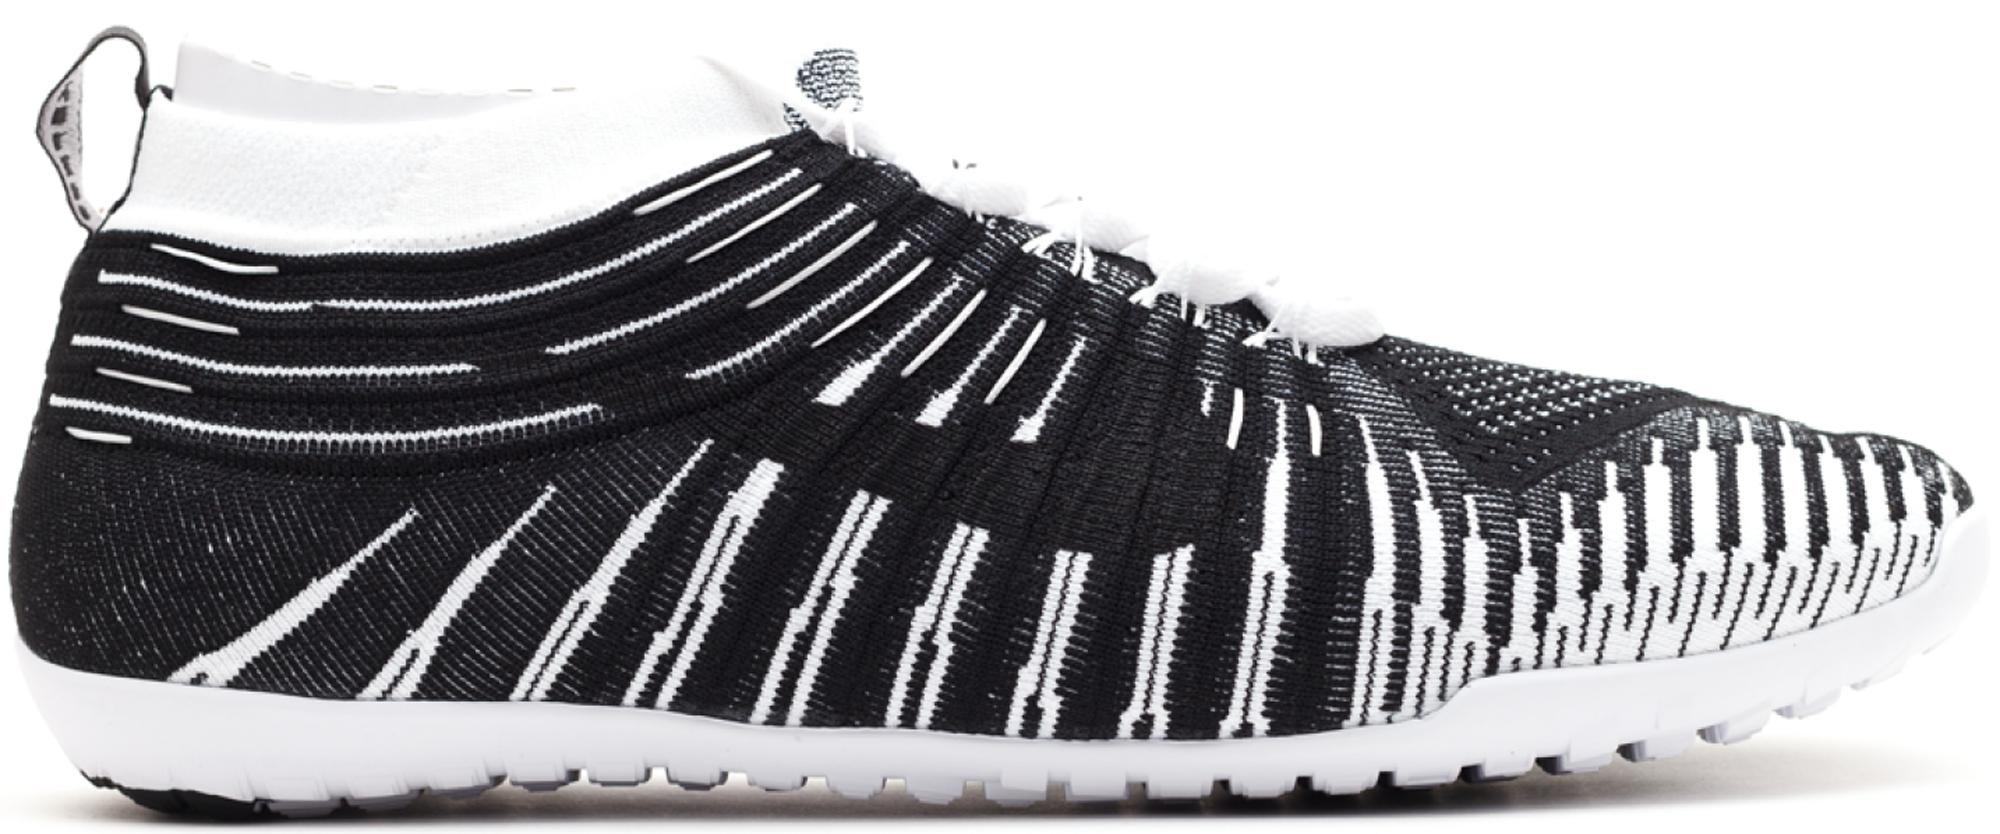 2016 Scarpa Donna Nike Free Hyperfeel Running Scarpe Corte